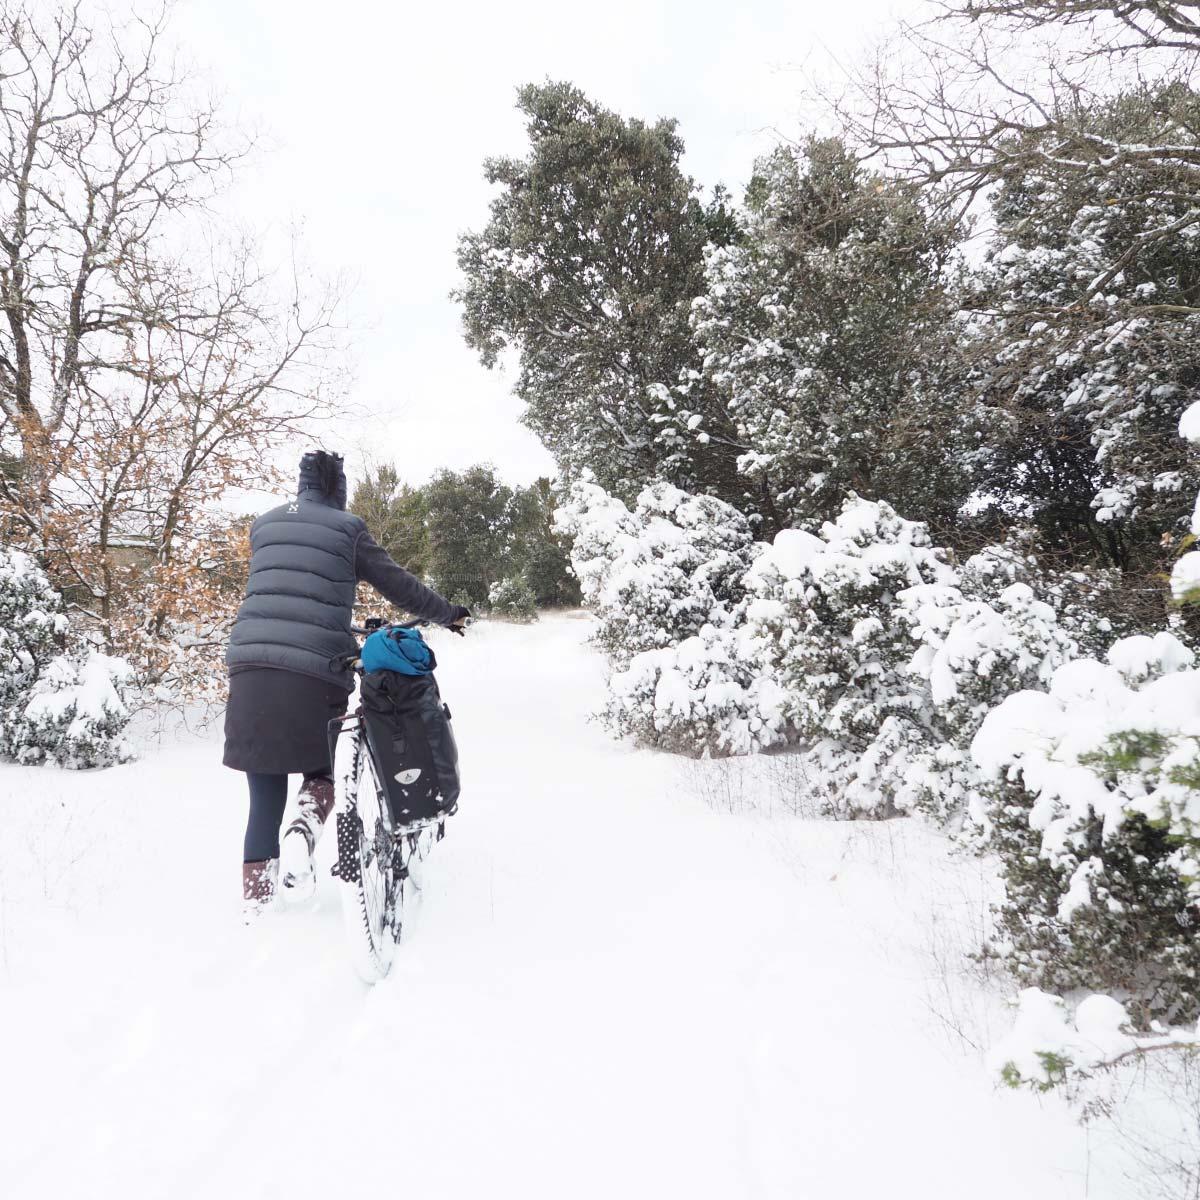 escapade-velo-hiver-neige-winter-biking-yoniquenews